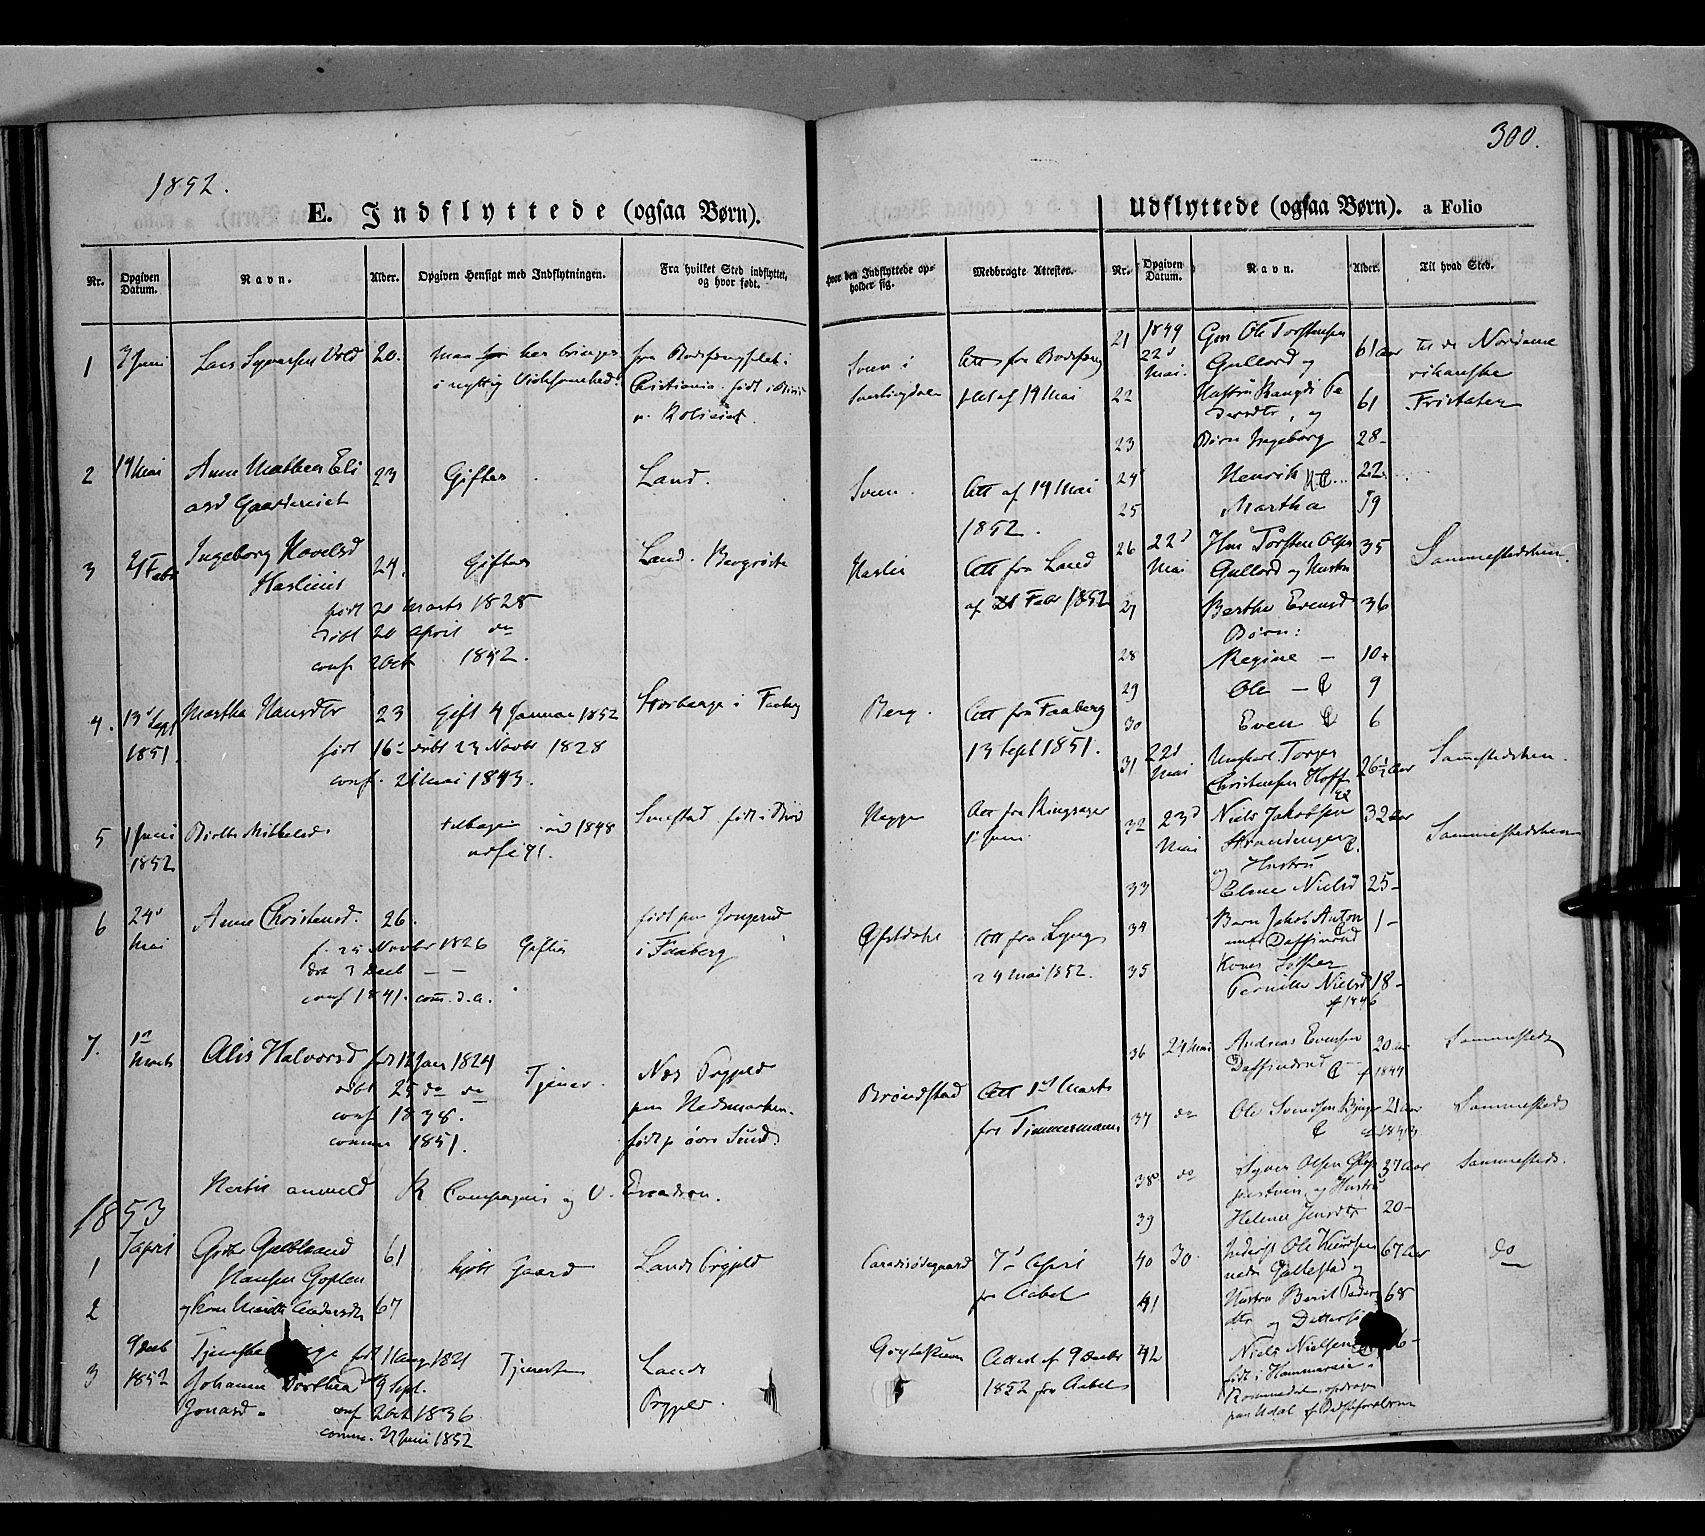 SAH, Biri prestekontor, Ministerialbok nr. 5, 1843-1854, s. 300